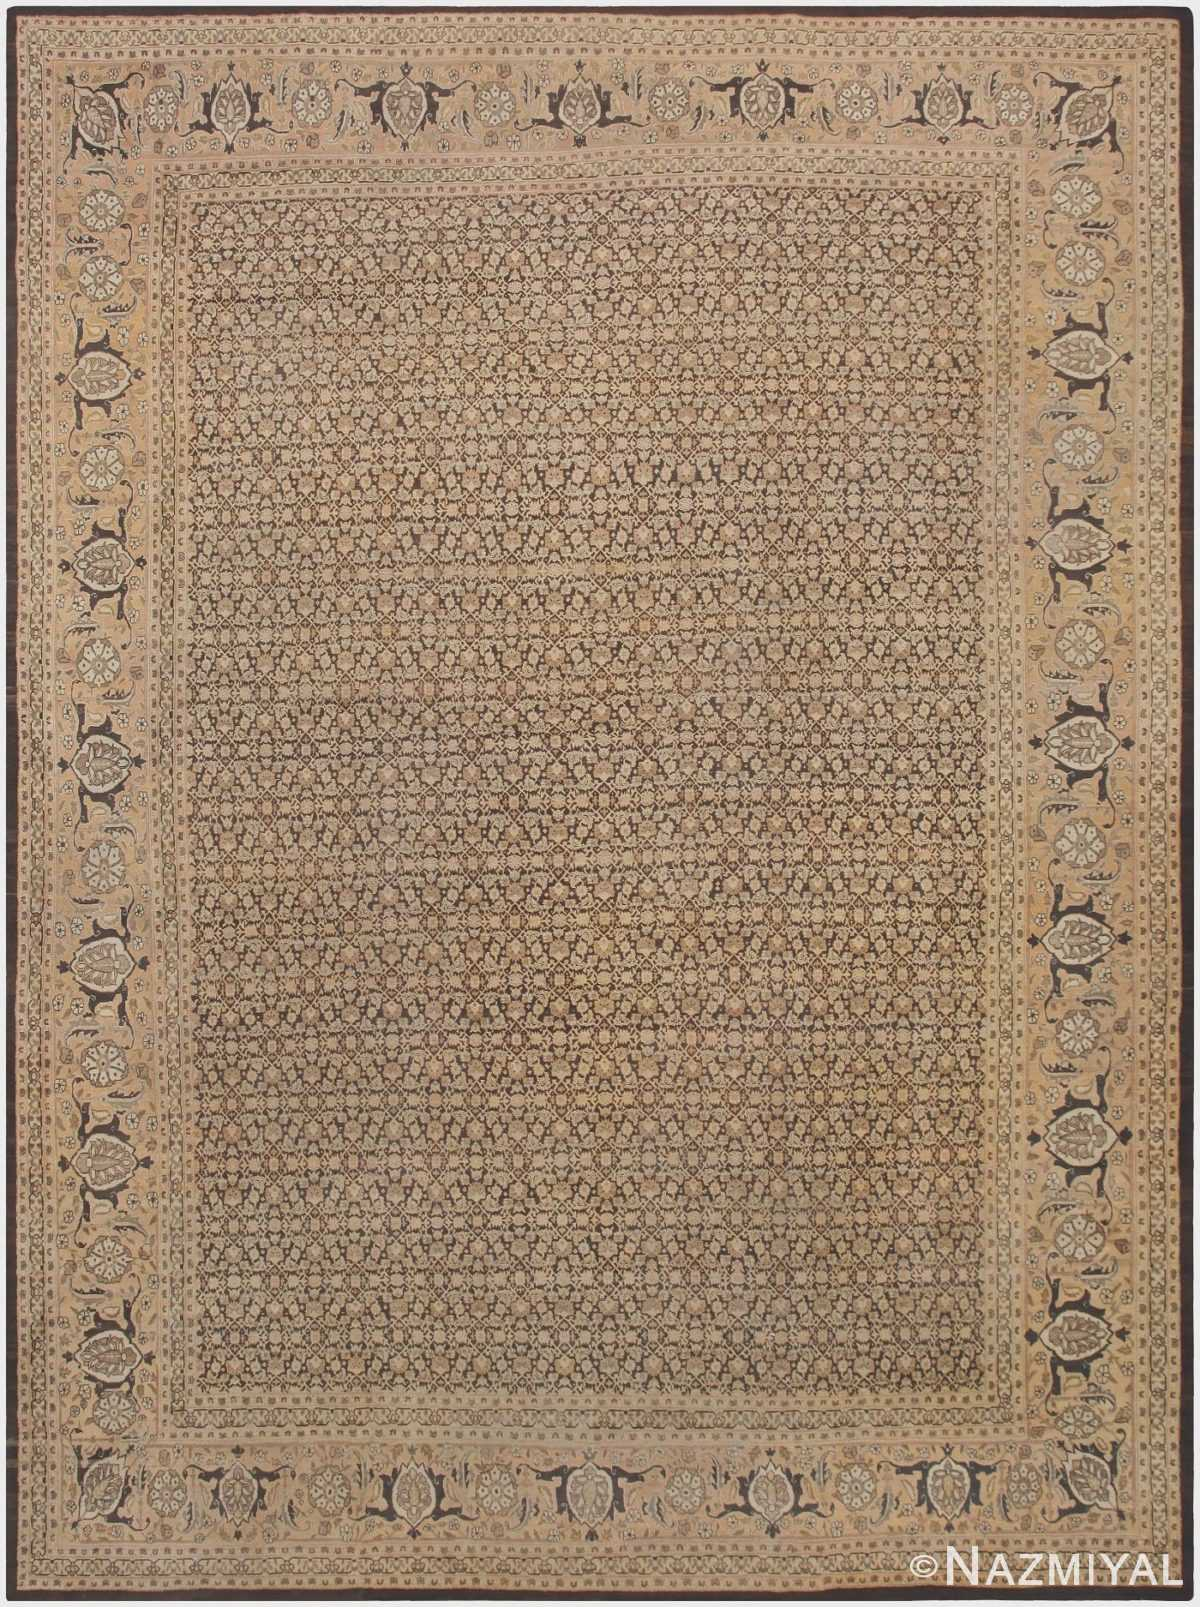 Large Antique Persian Tabriz Rug 46808 by Nazmiyal